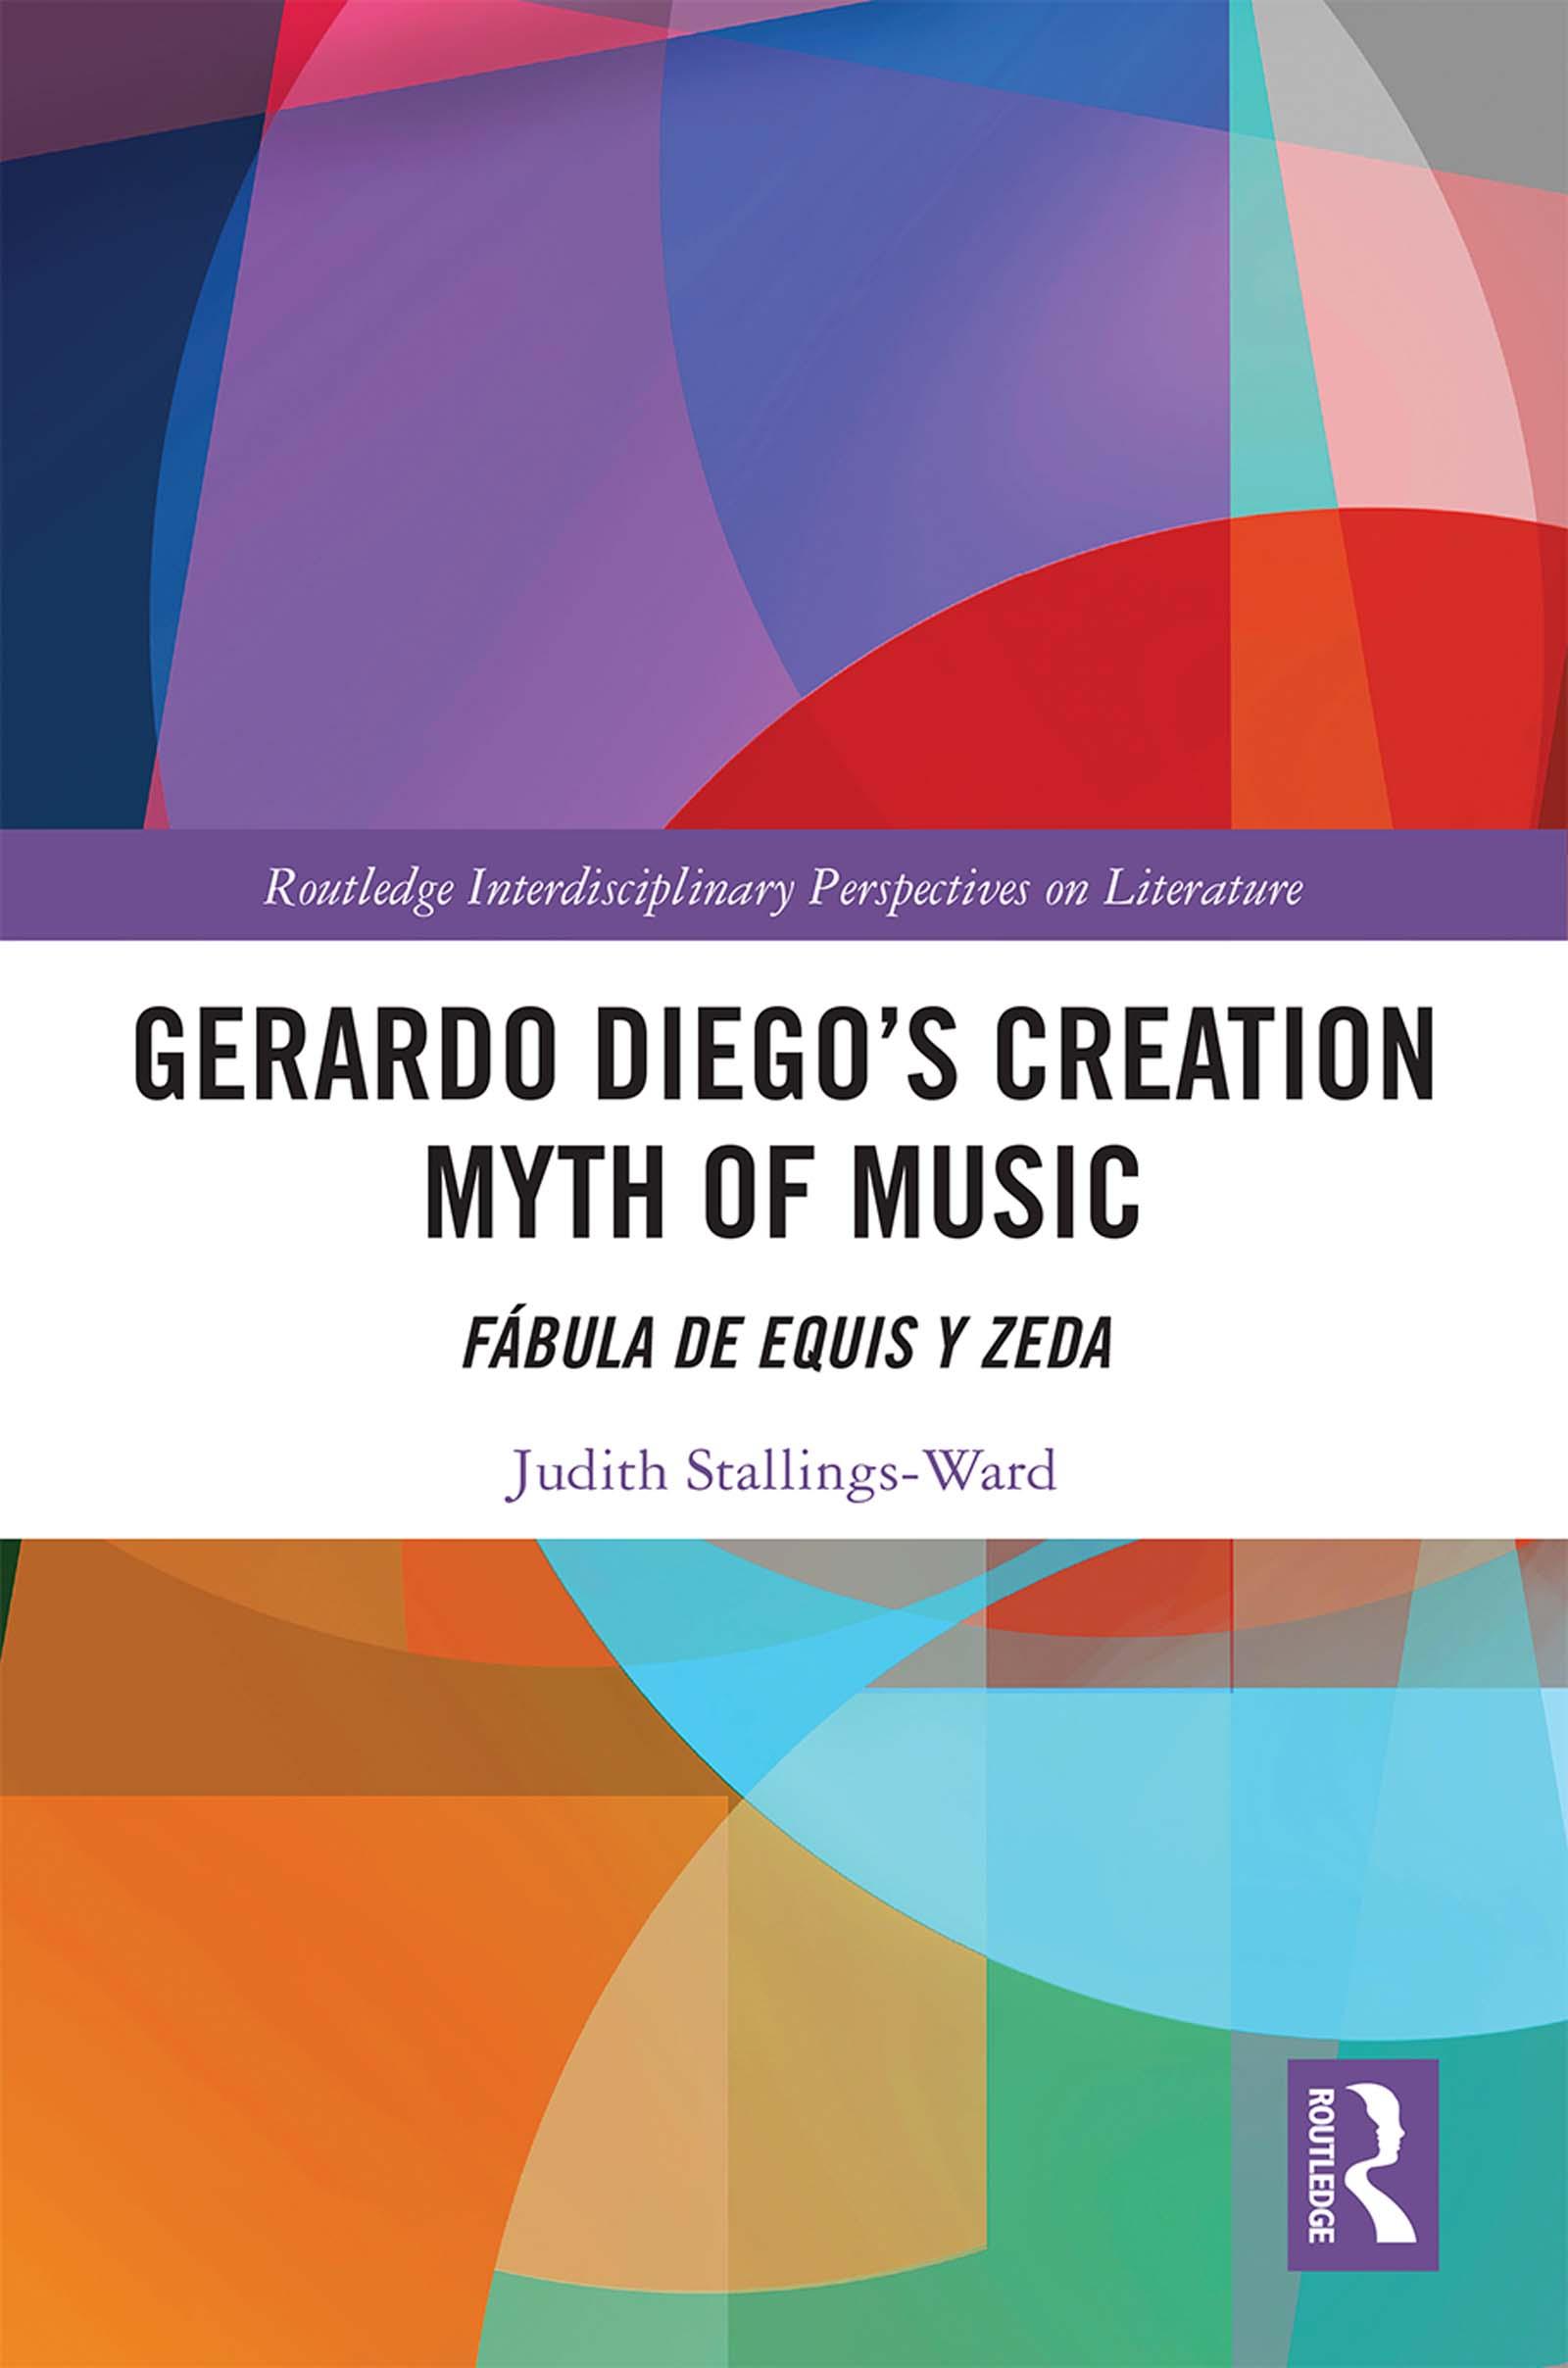 Gerardo Diego's Creation Myth of Music: Fábula de Equis y Zeda book cover